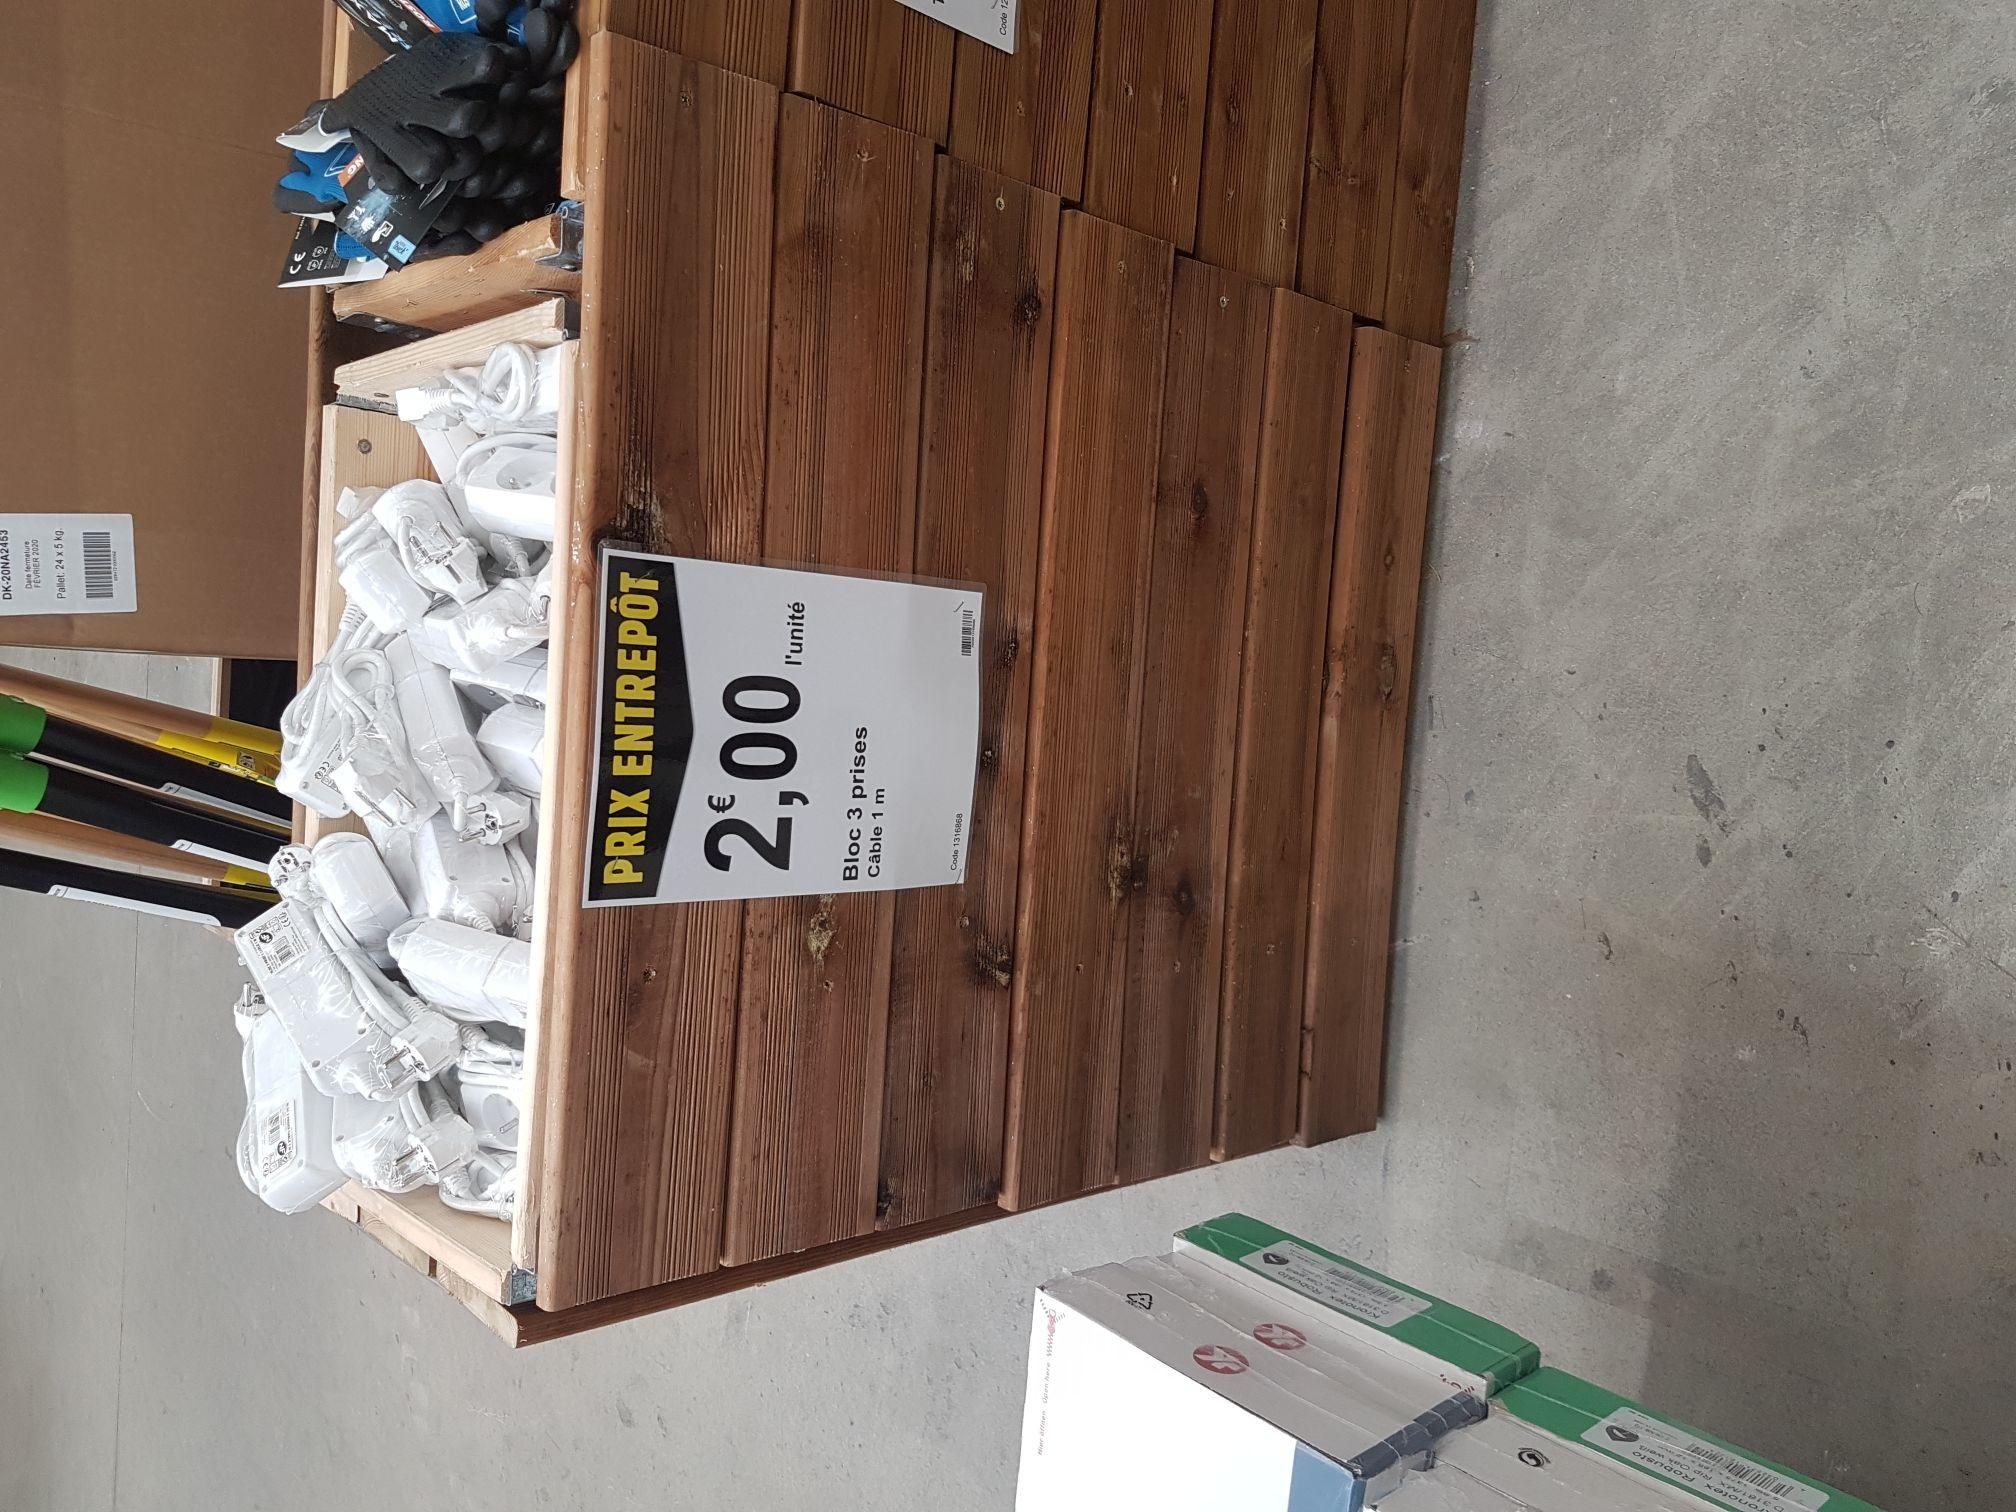 Bloc multri-prises (3 prises, câble 1 m) - L'Entrepôt du Bricolage Drumettaz-Clarafond (73)